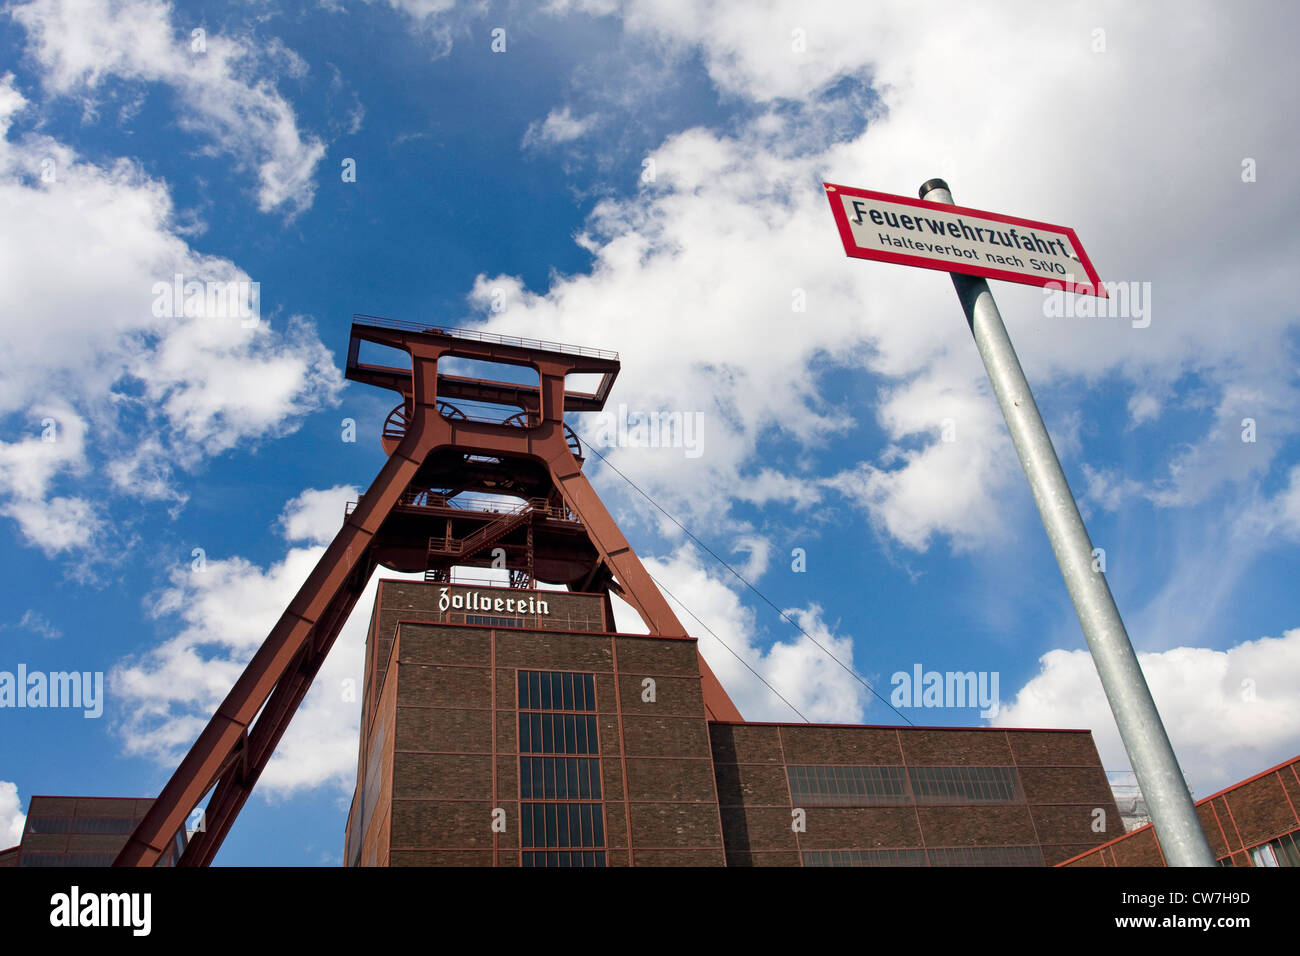 Zollverein Coal Mine Industrial Complex, Germany, North Rhine-Westphalia, Ruhr Area, Essen - Stock Image